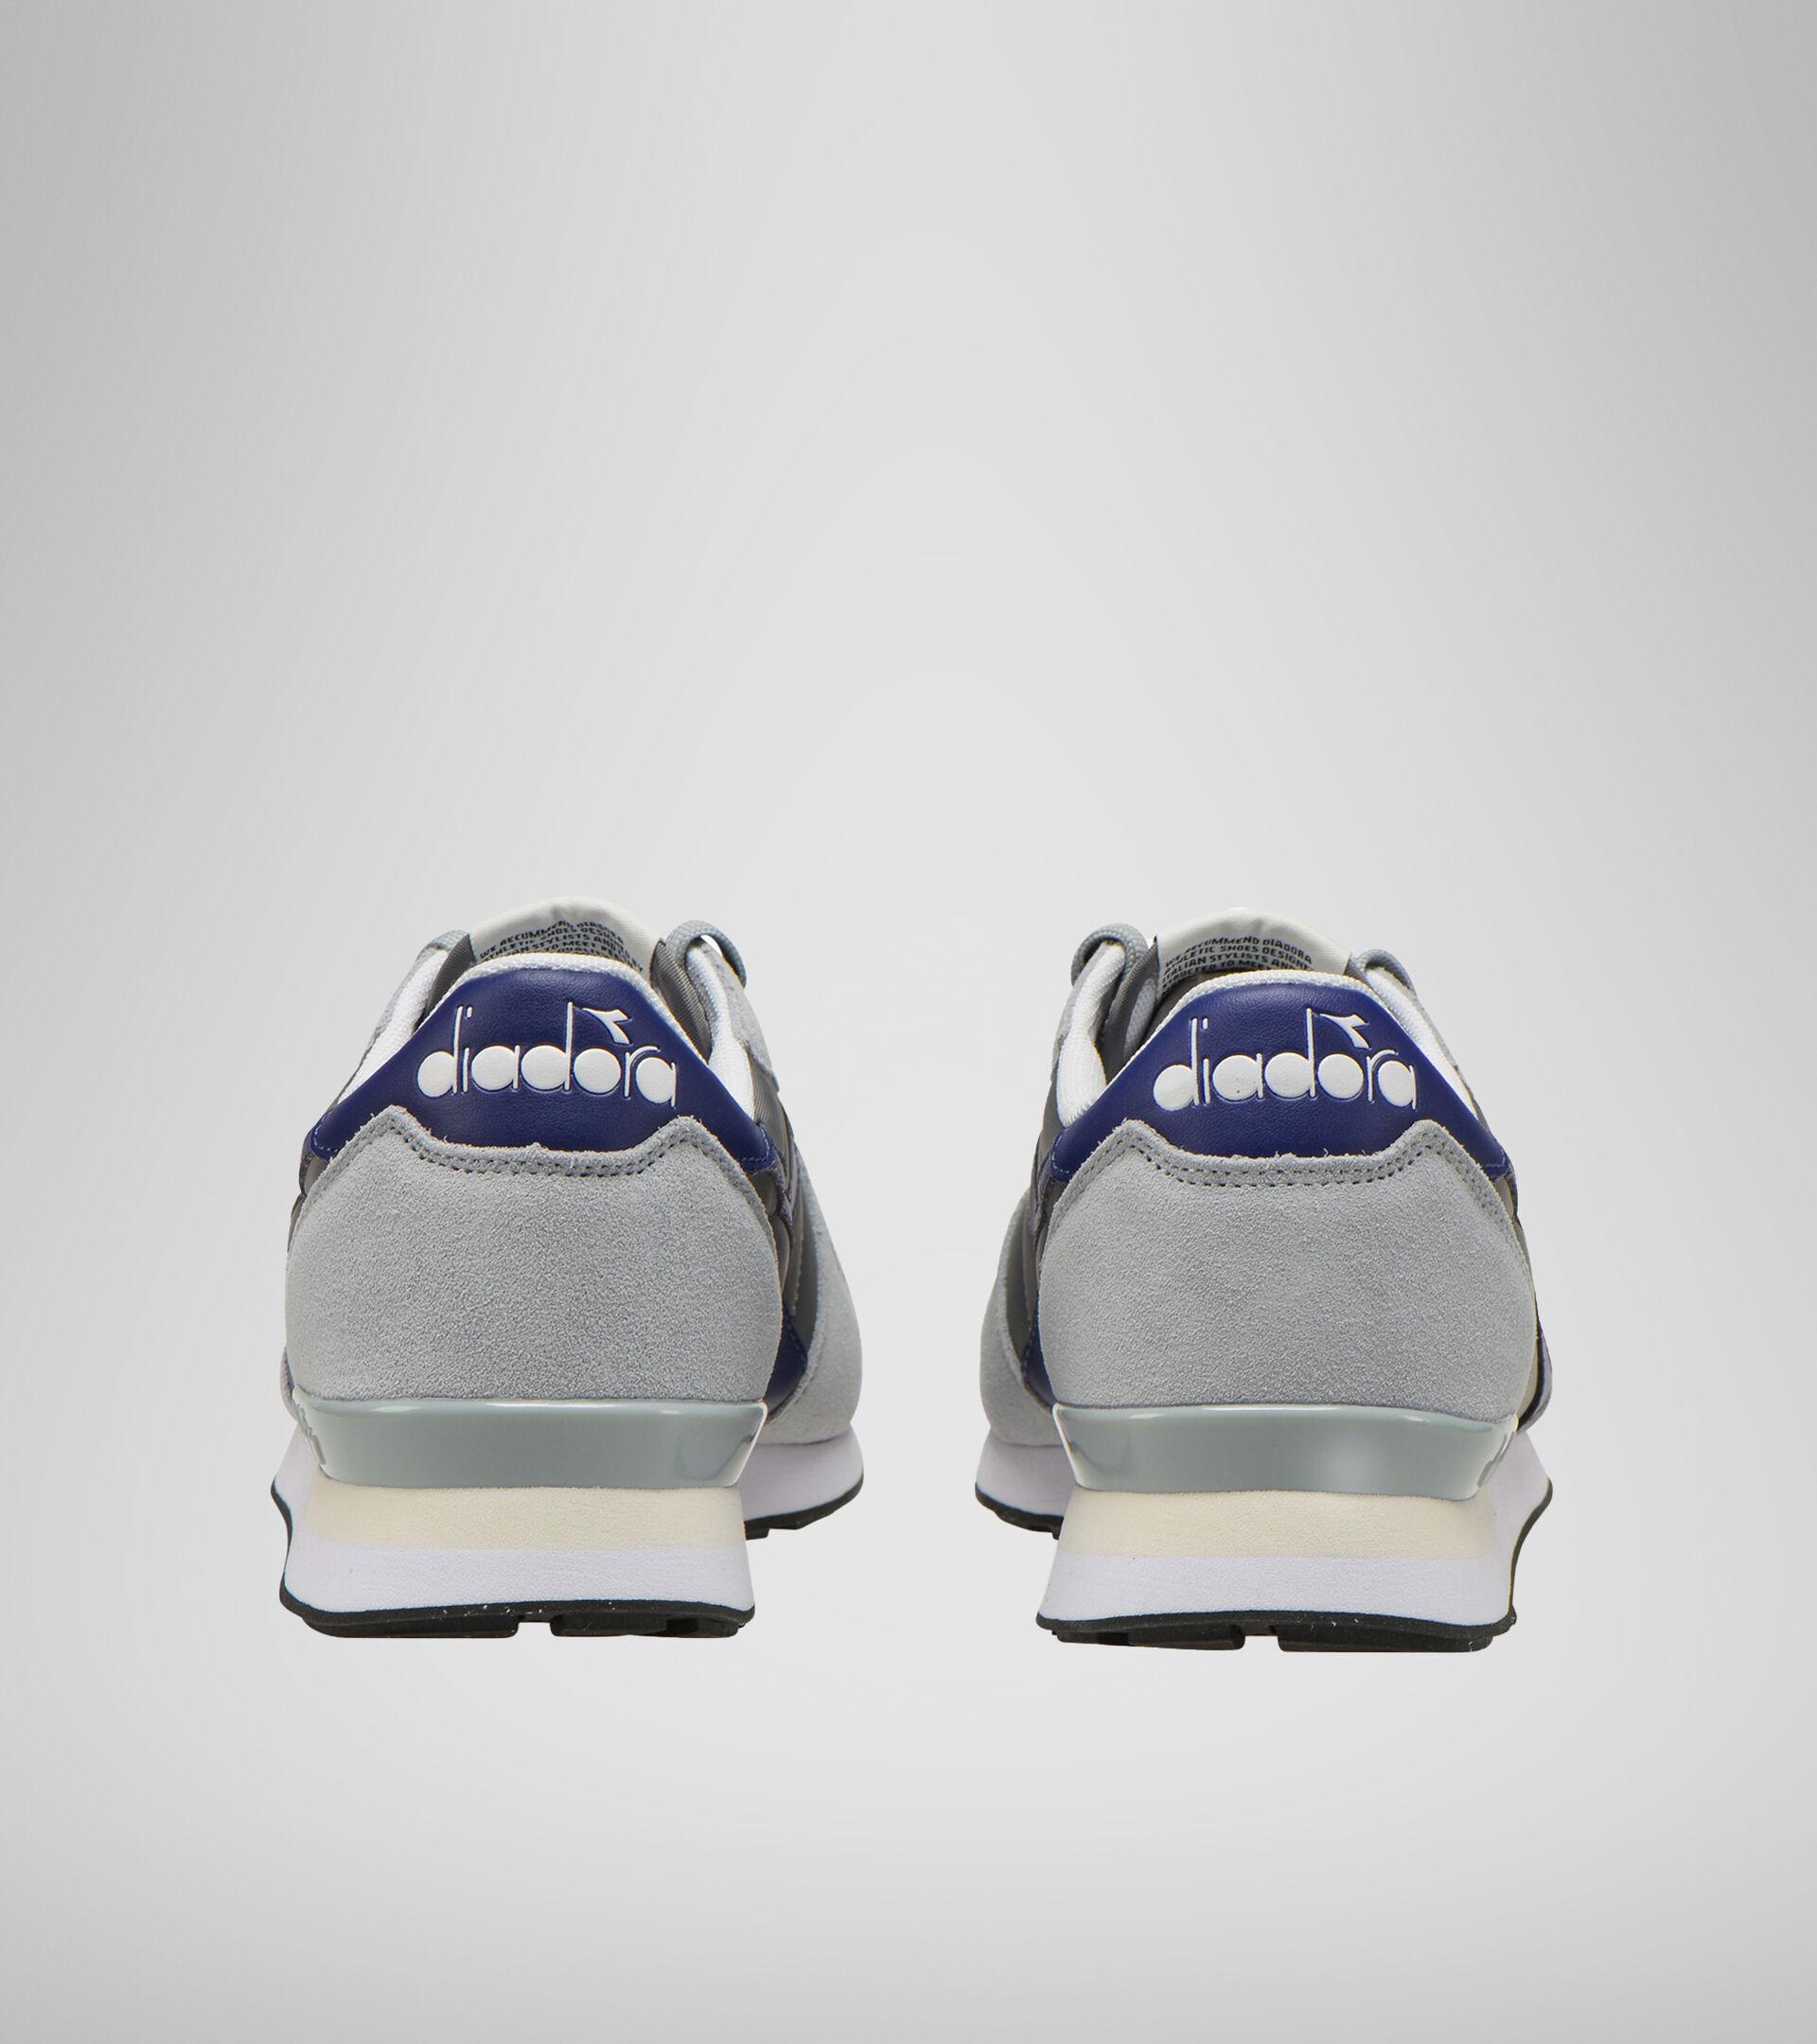 Footwear Sportswear UNISEX CAMARO GR GRATTACIELO/GR BUFERA/BL ST Diadora